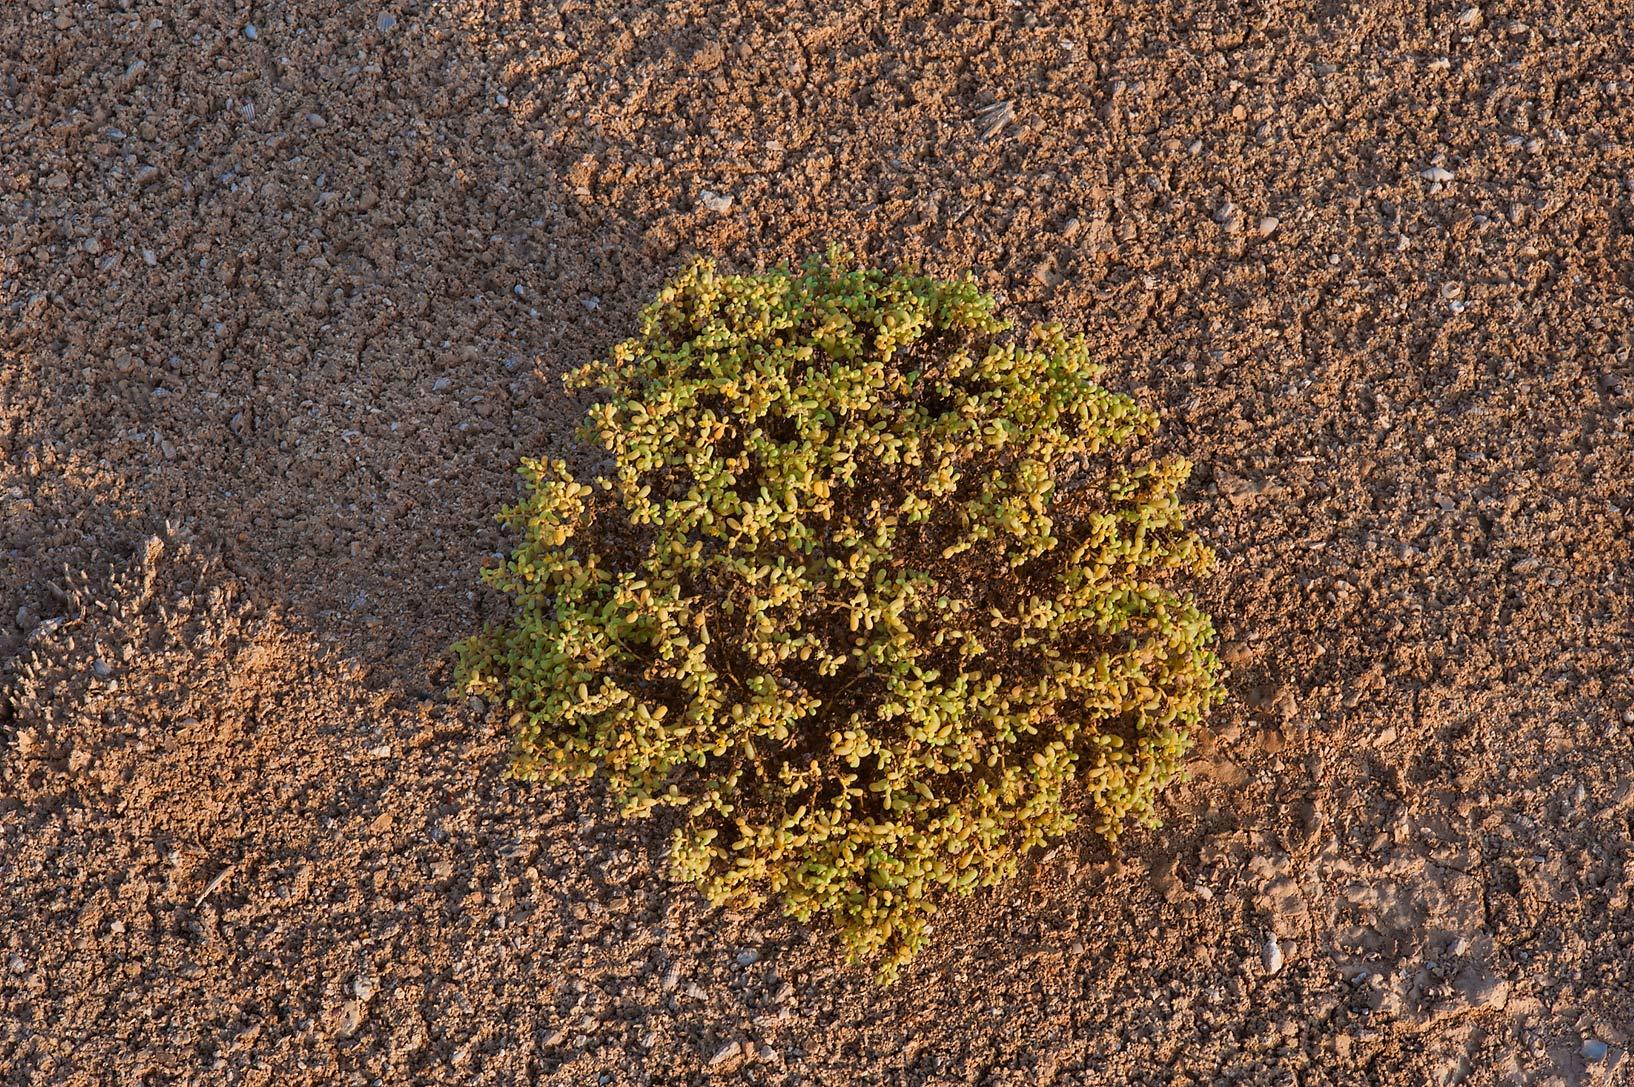 photo 150509 pillow like plant of zygophyllum simplex